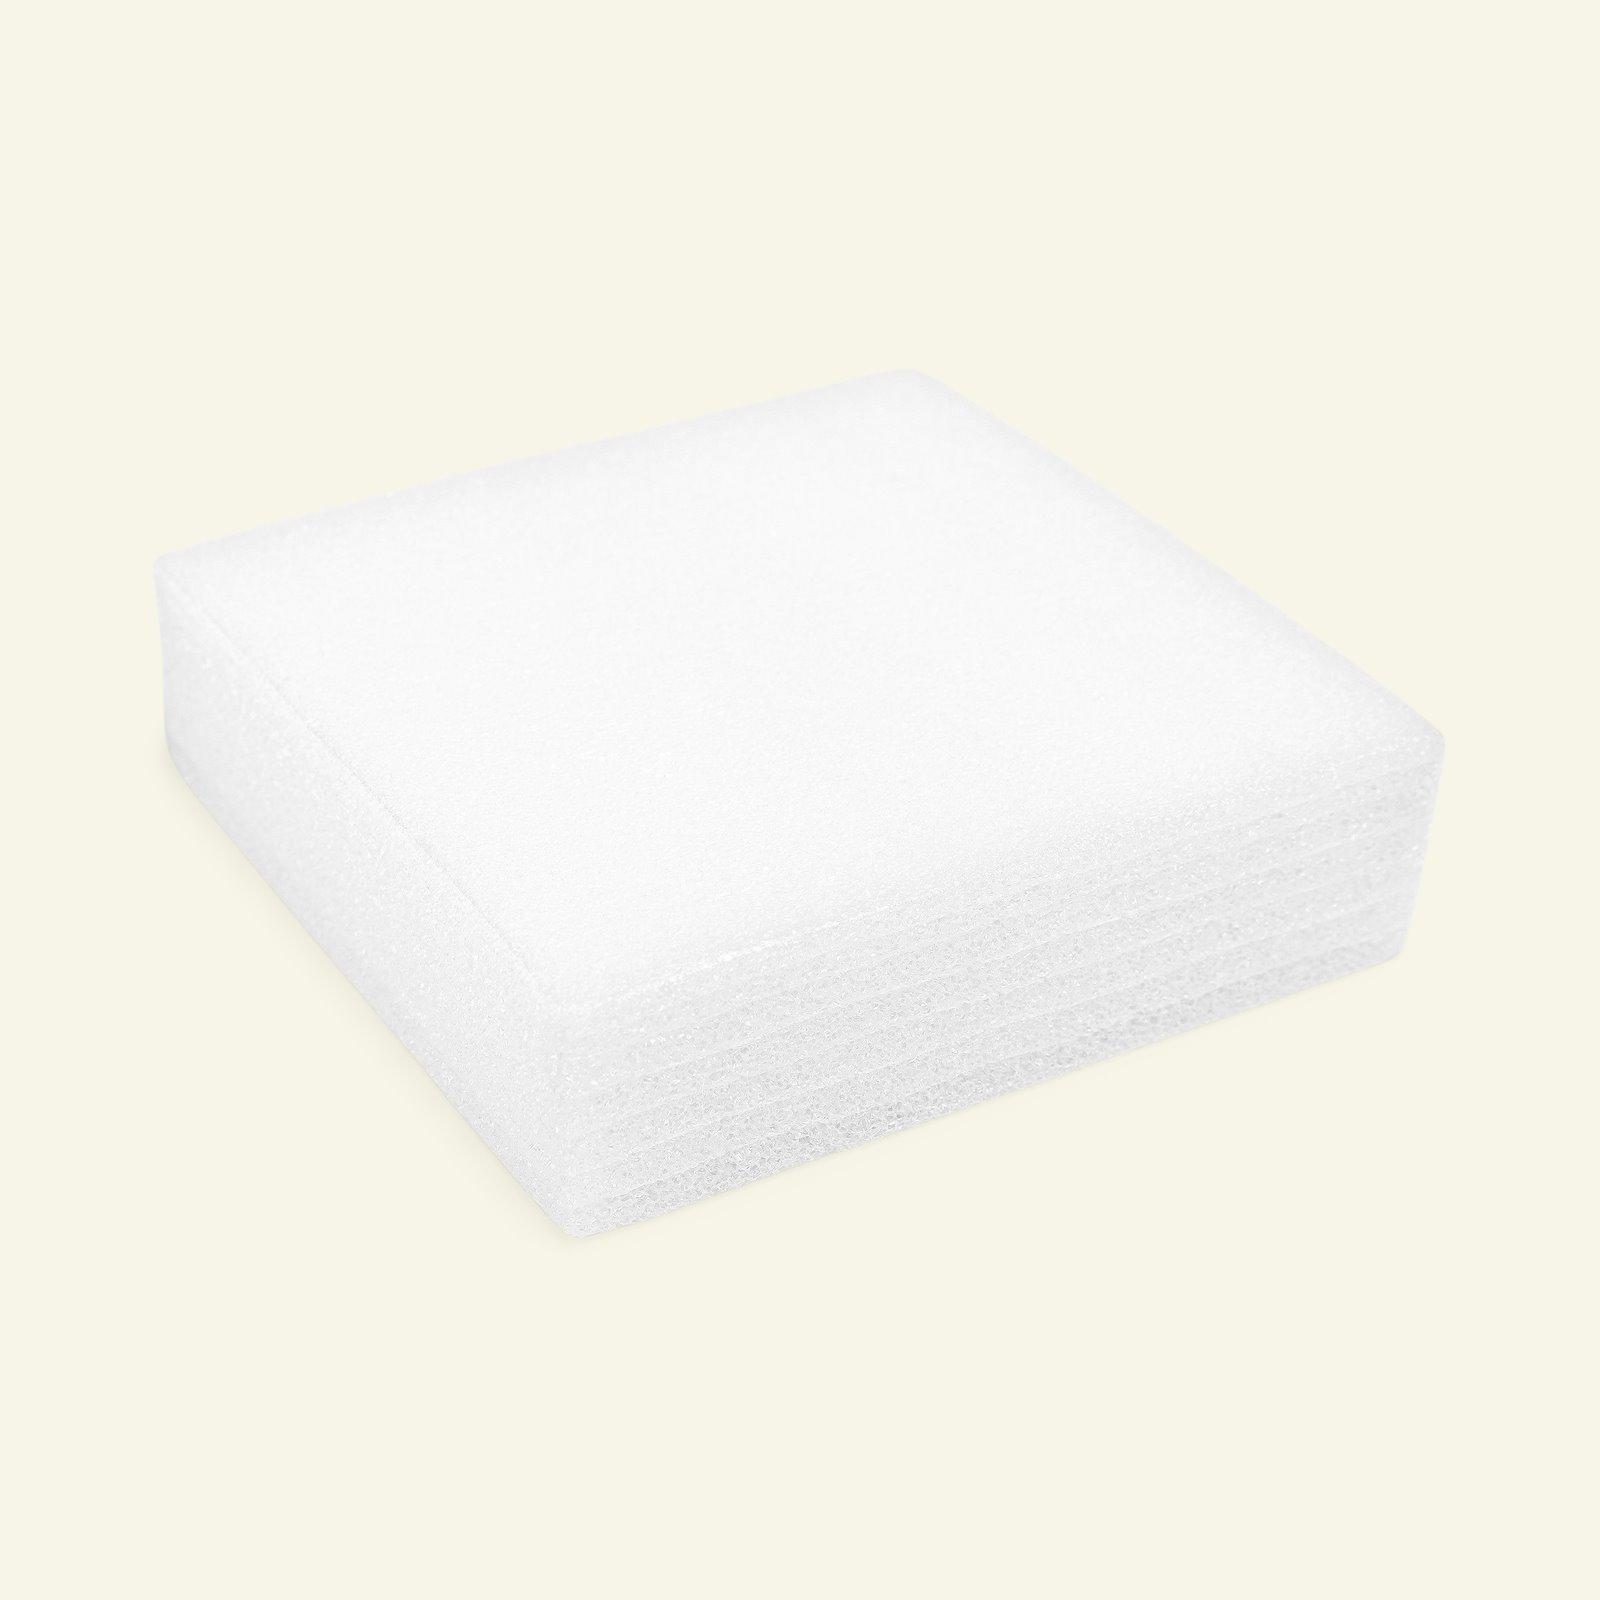 Felting cushion 18x18x5cm white 1 pcs 37000_pack